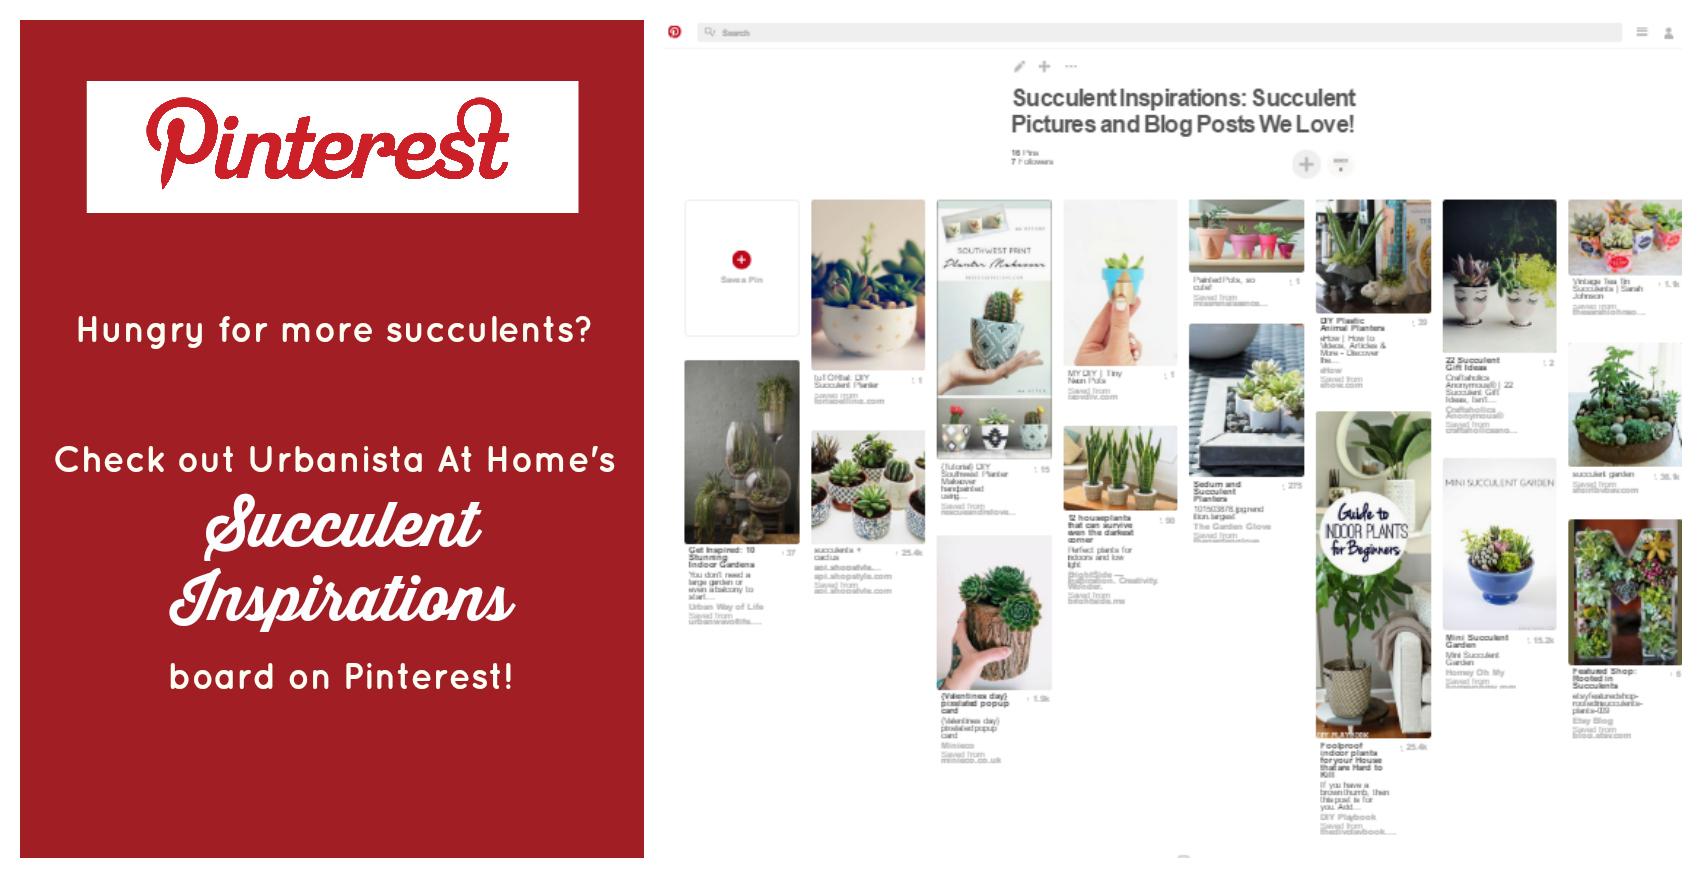 urbanistaathome-com-pinterest-succulent-inspirations